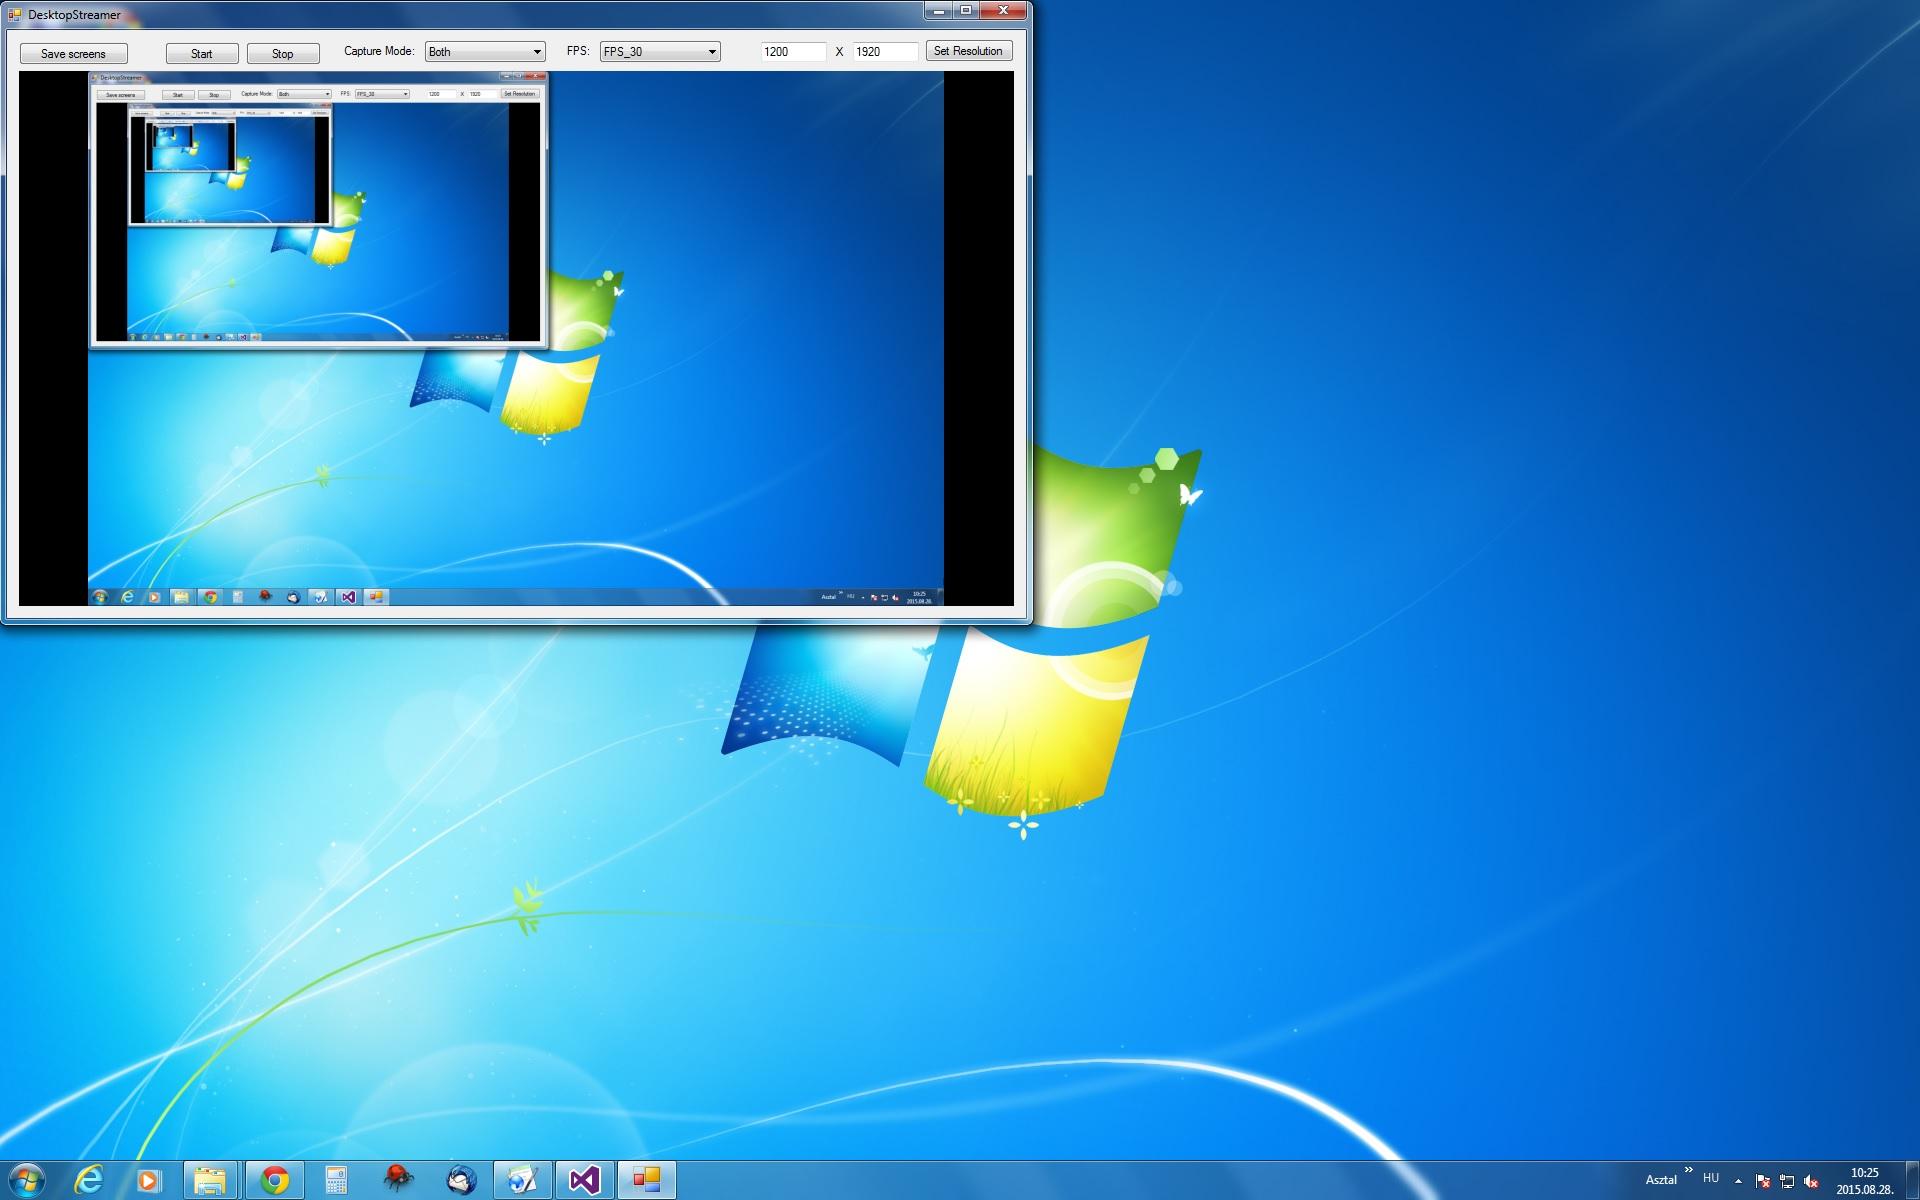 C# Camera SDK: Screen capture function - ScreenCapture